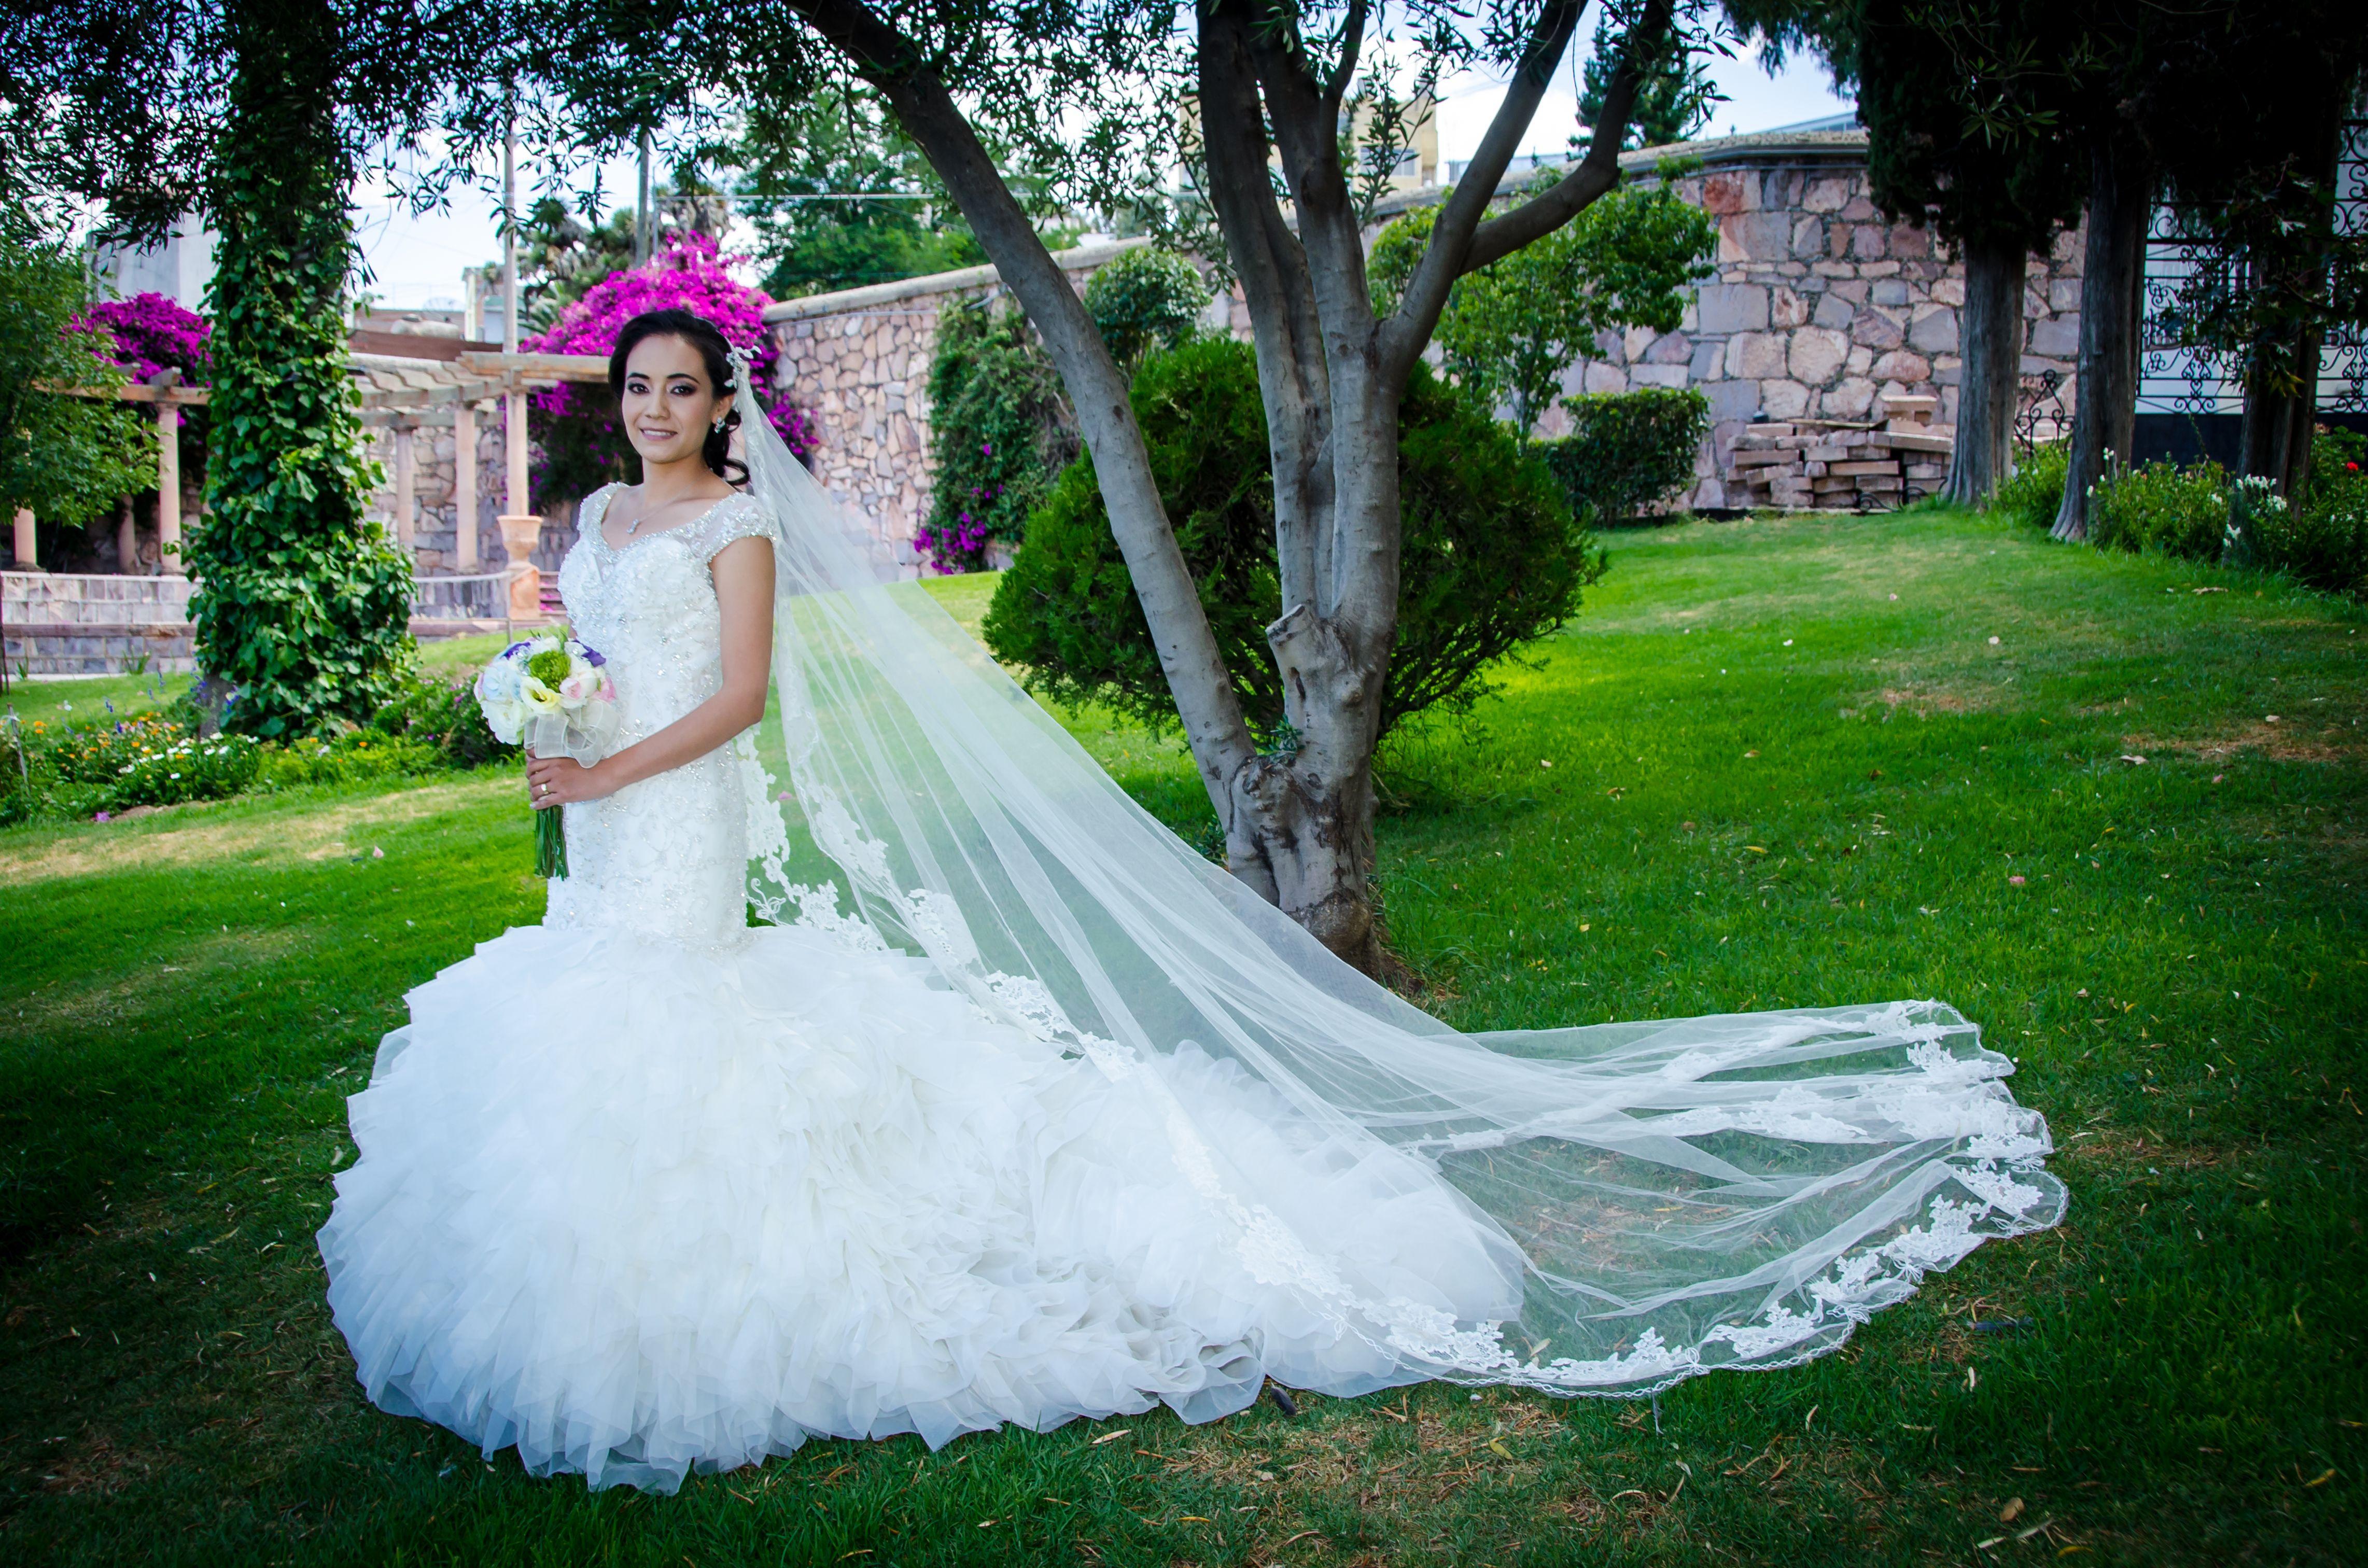 Repurpose wedding dress  Pin by Claudia Espinosa on Bodas Eventos y Mas  Pinterest